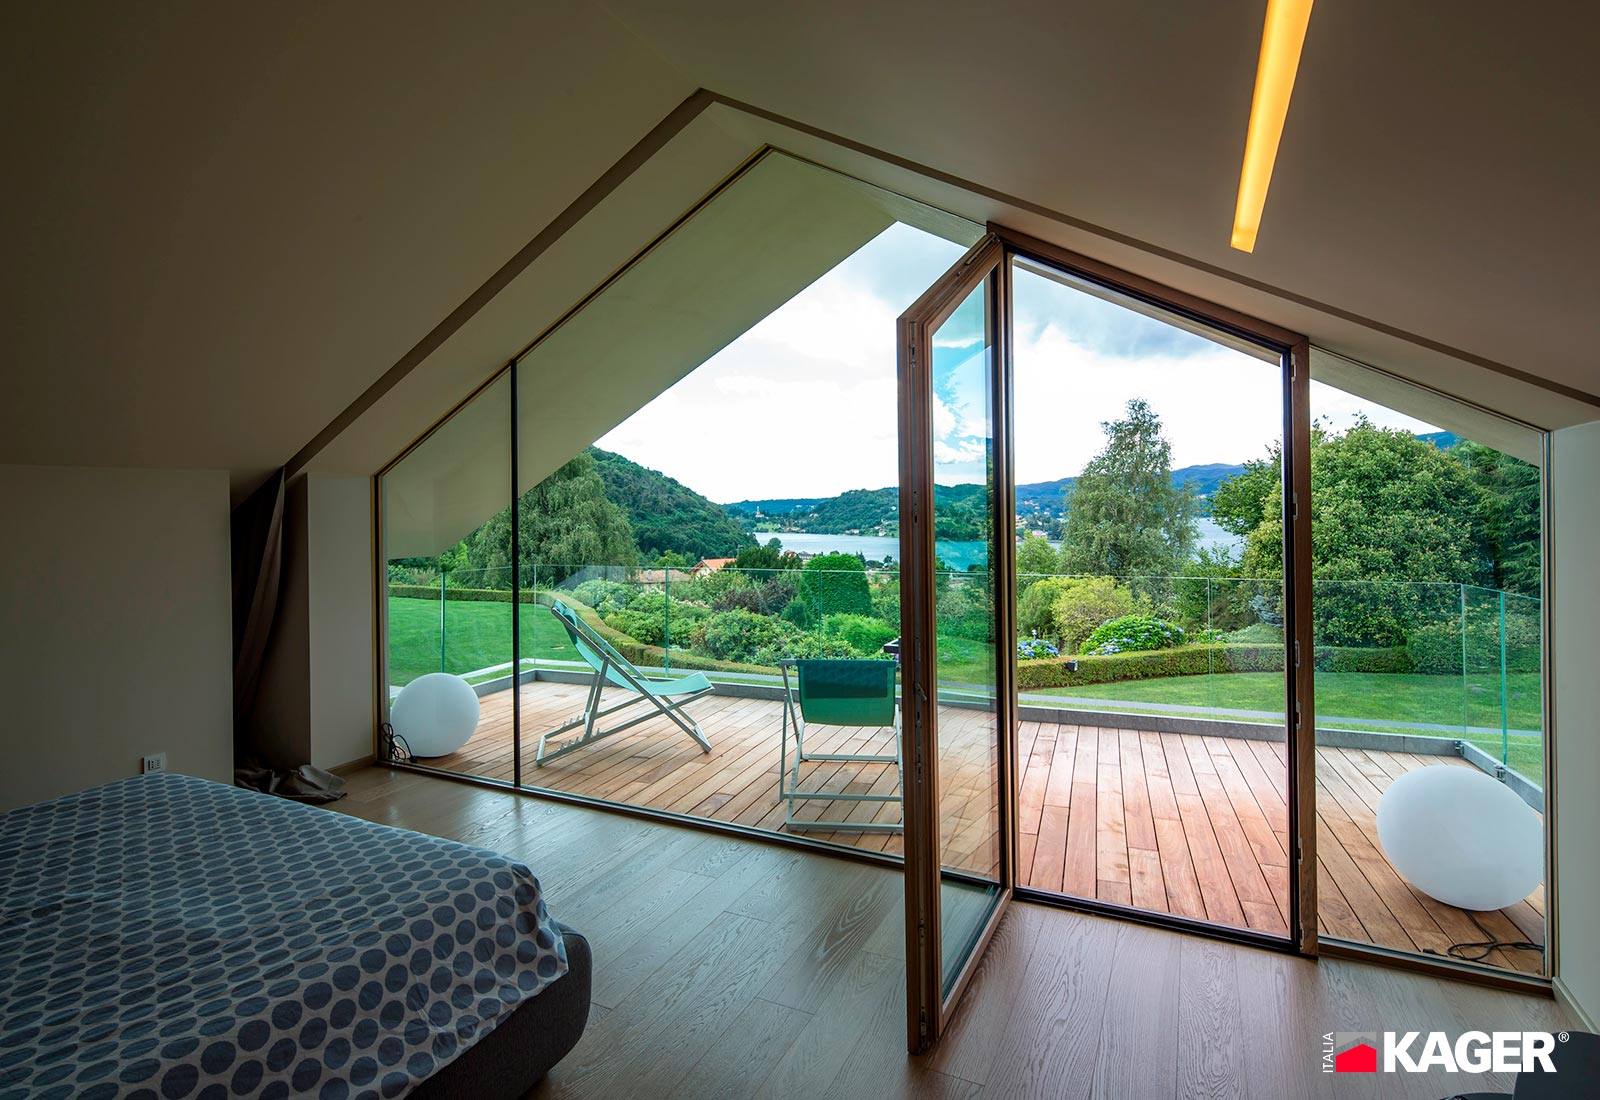 Casa-in-legno-Novara-Kager-Italia-09